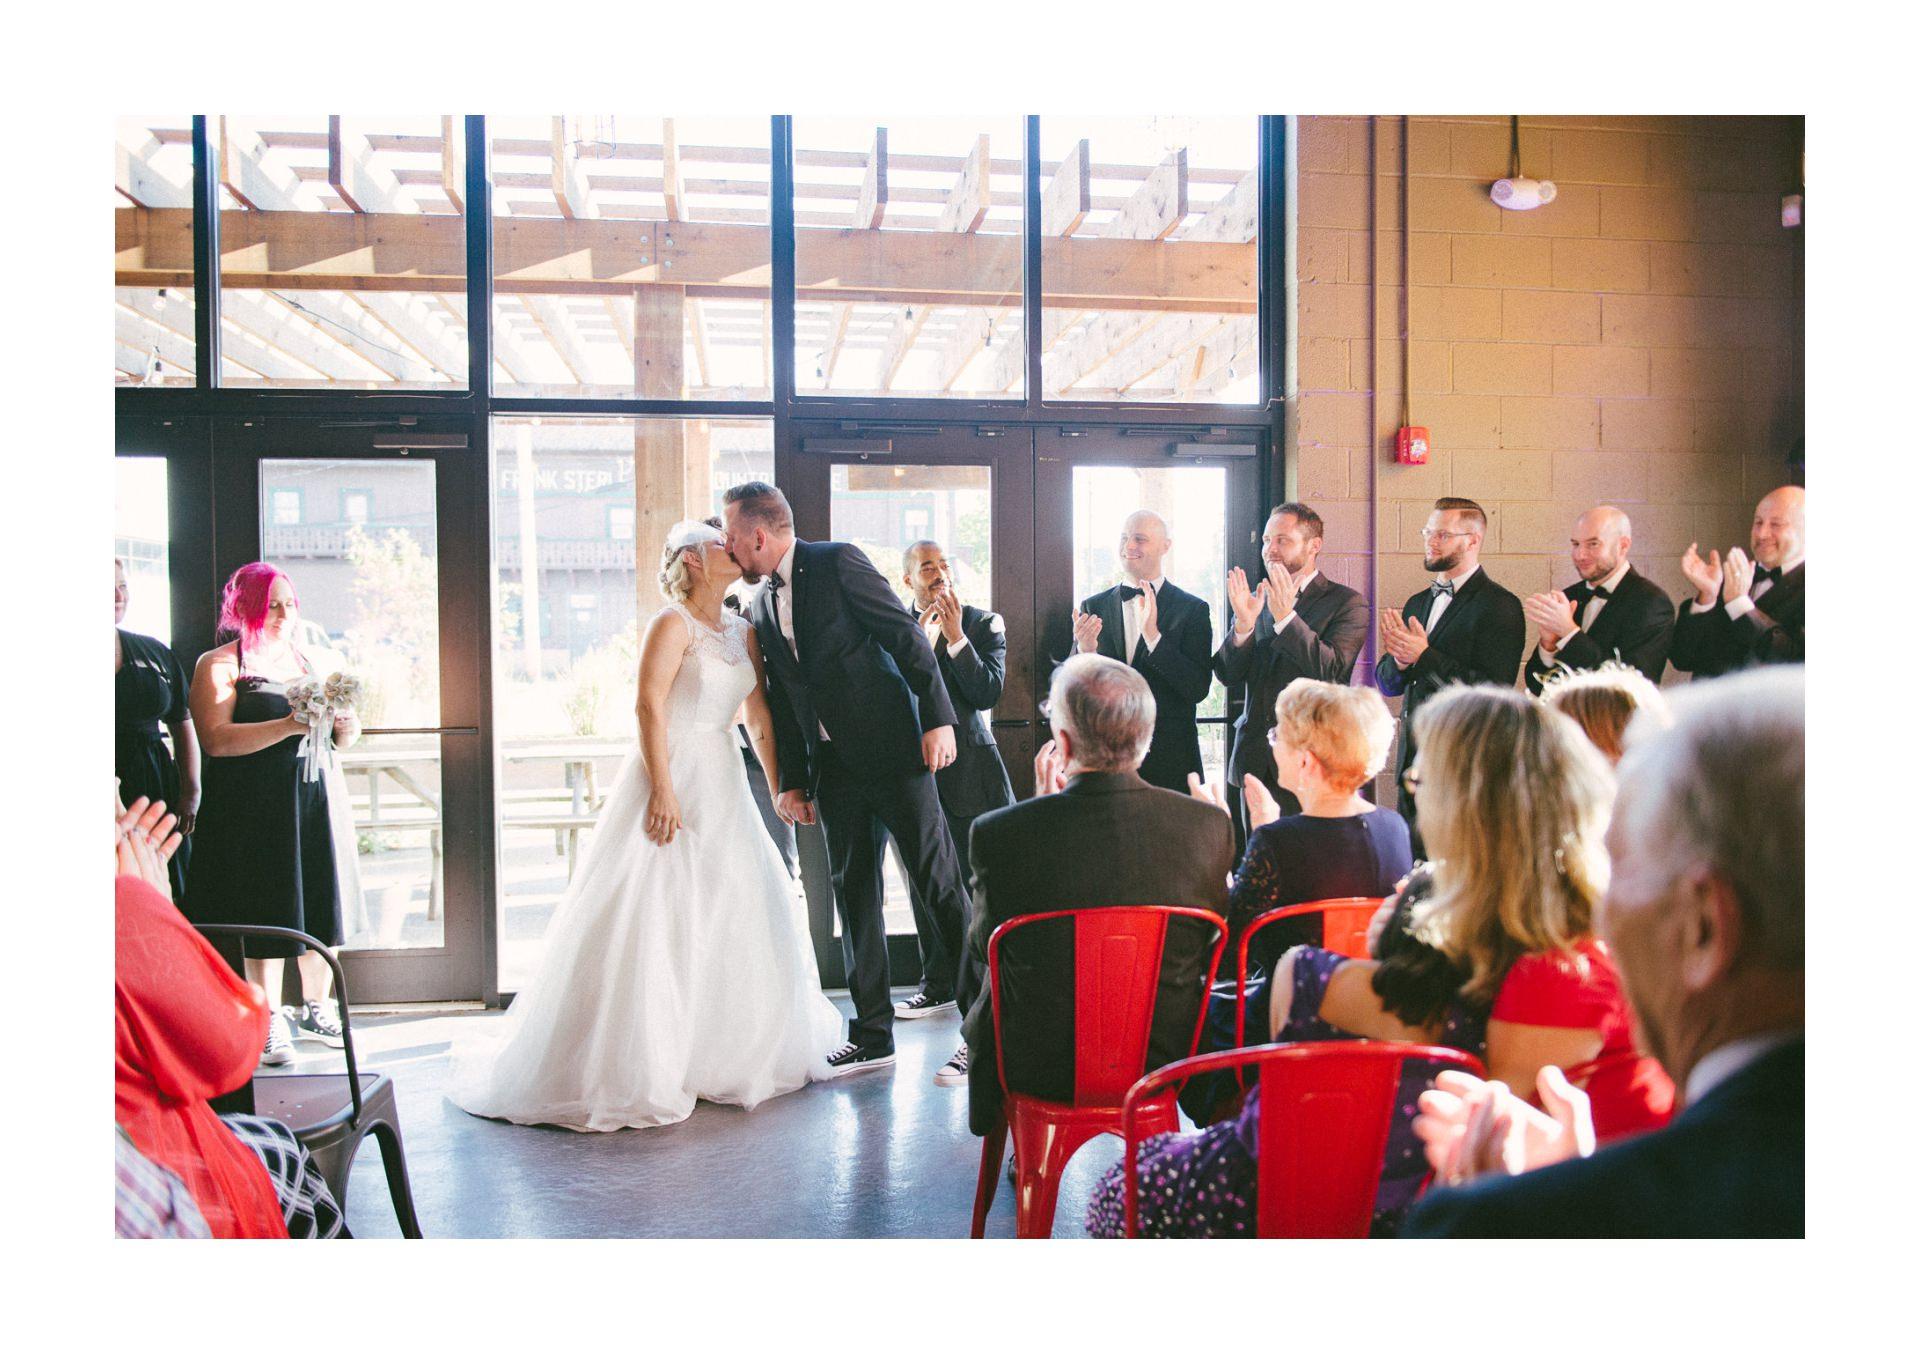 Goldhorn Brewery Wedding Photos in Cleveland 2 19.jpg